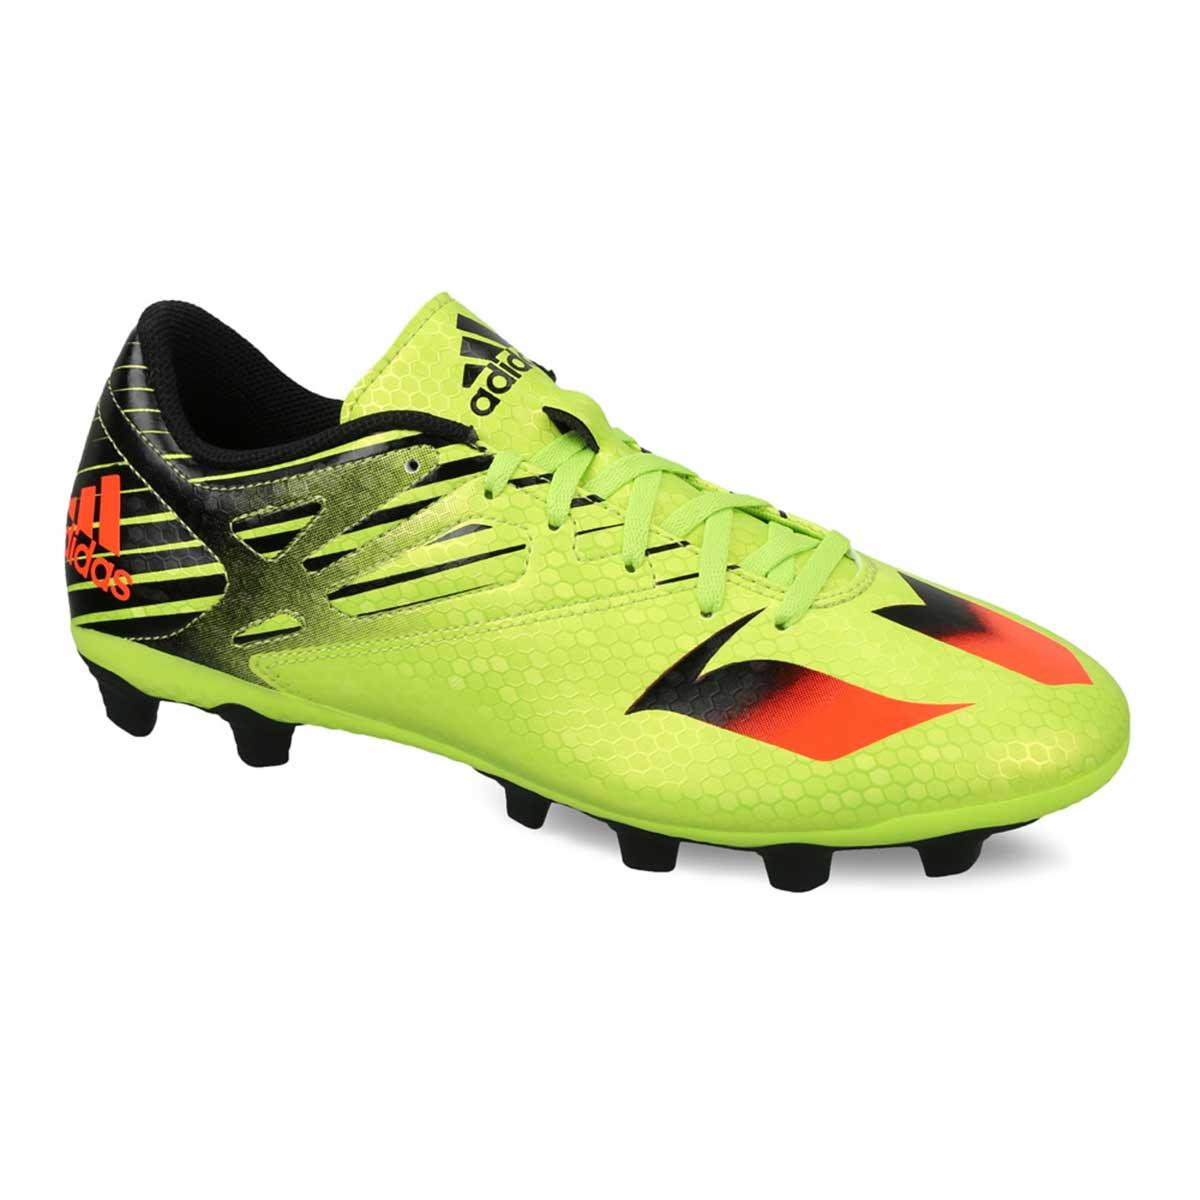 navegación ficción Reafirmar  Buy Adidas Messi 15.4 FXG Football Shoes (Green/Red/Black) Online